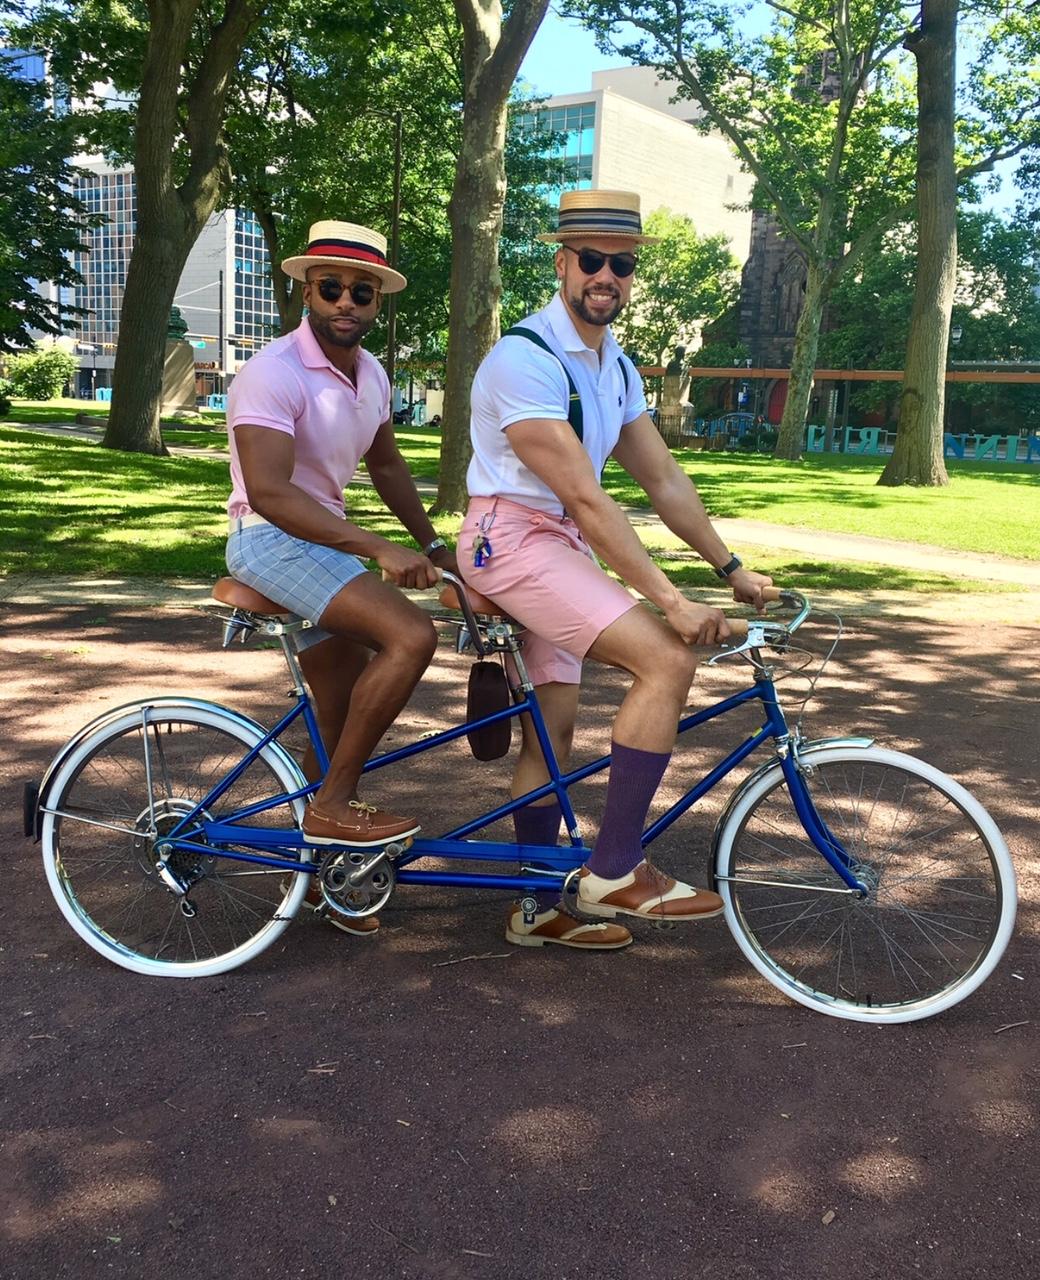 Newark Historical Renaissance Ride 2018 Best Bike Winner